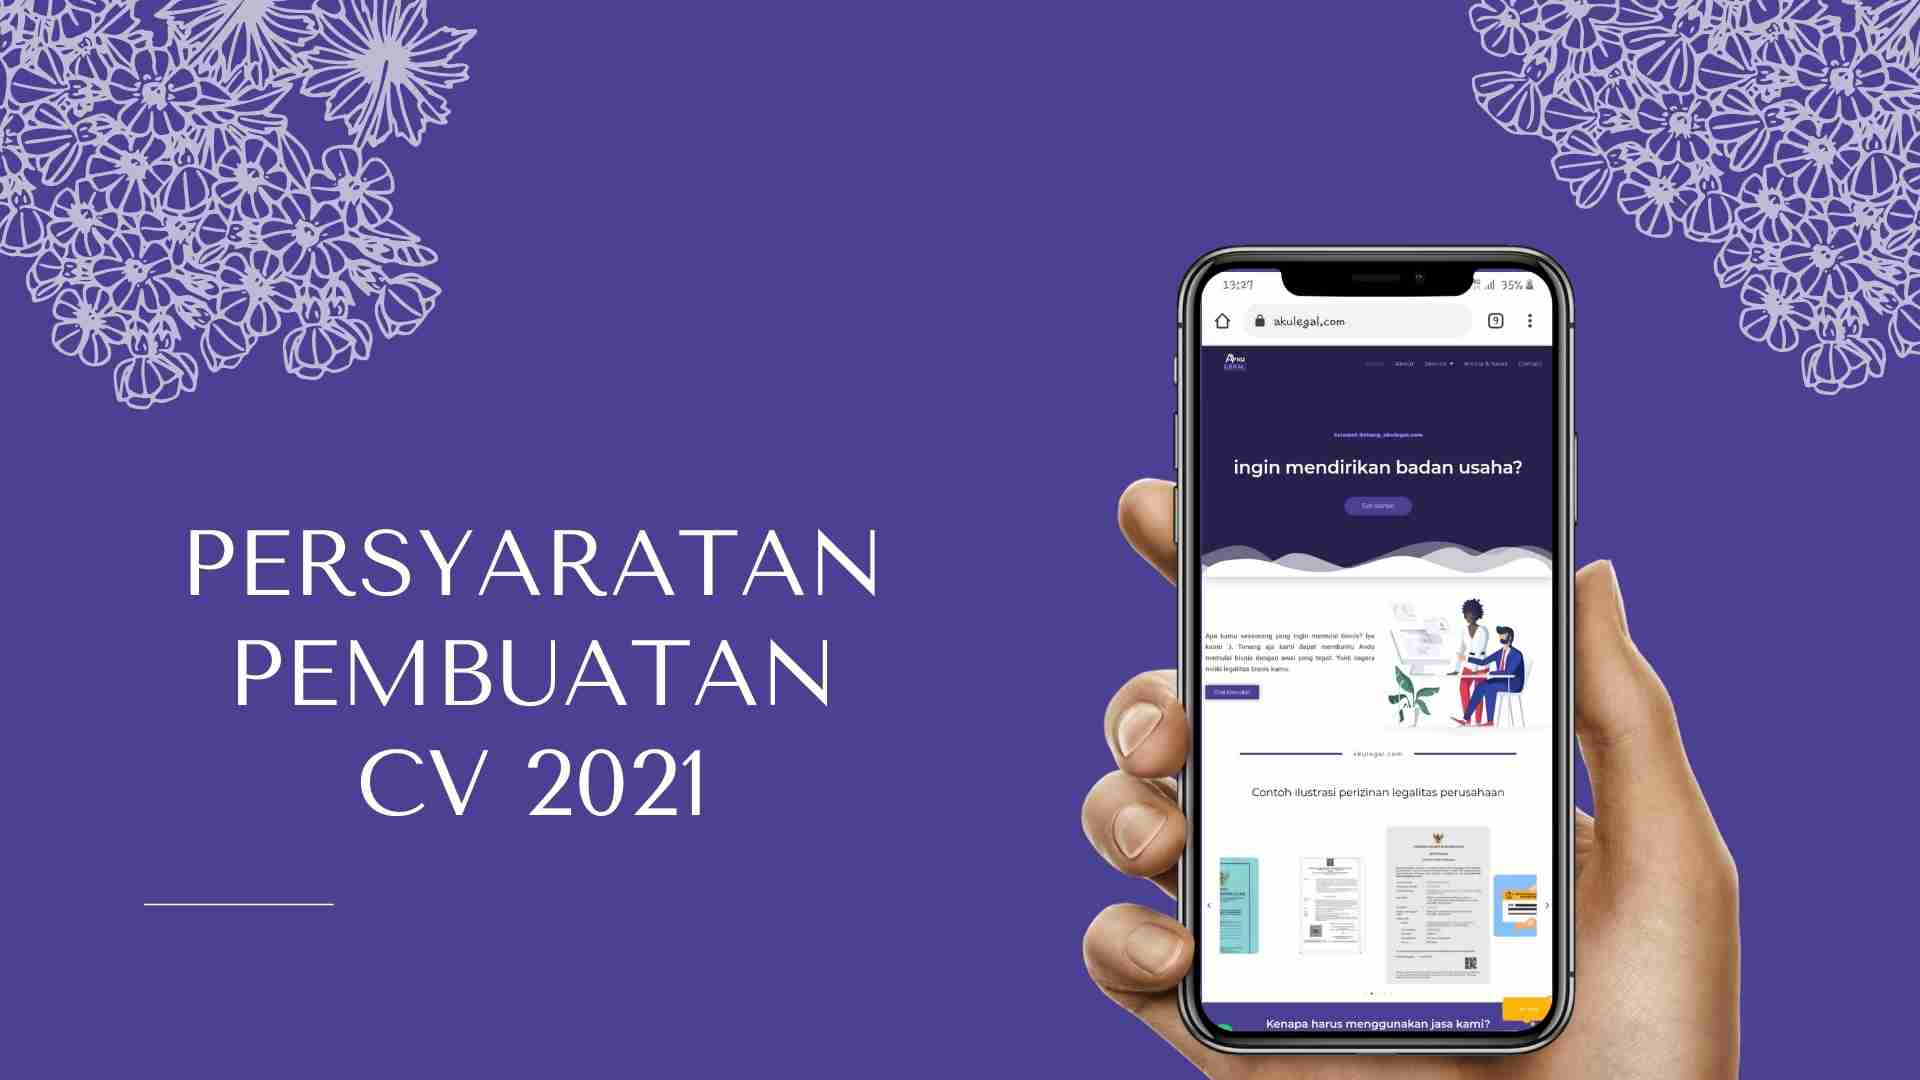 persyaratan pembuatan cv 2021